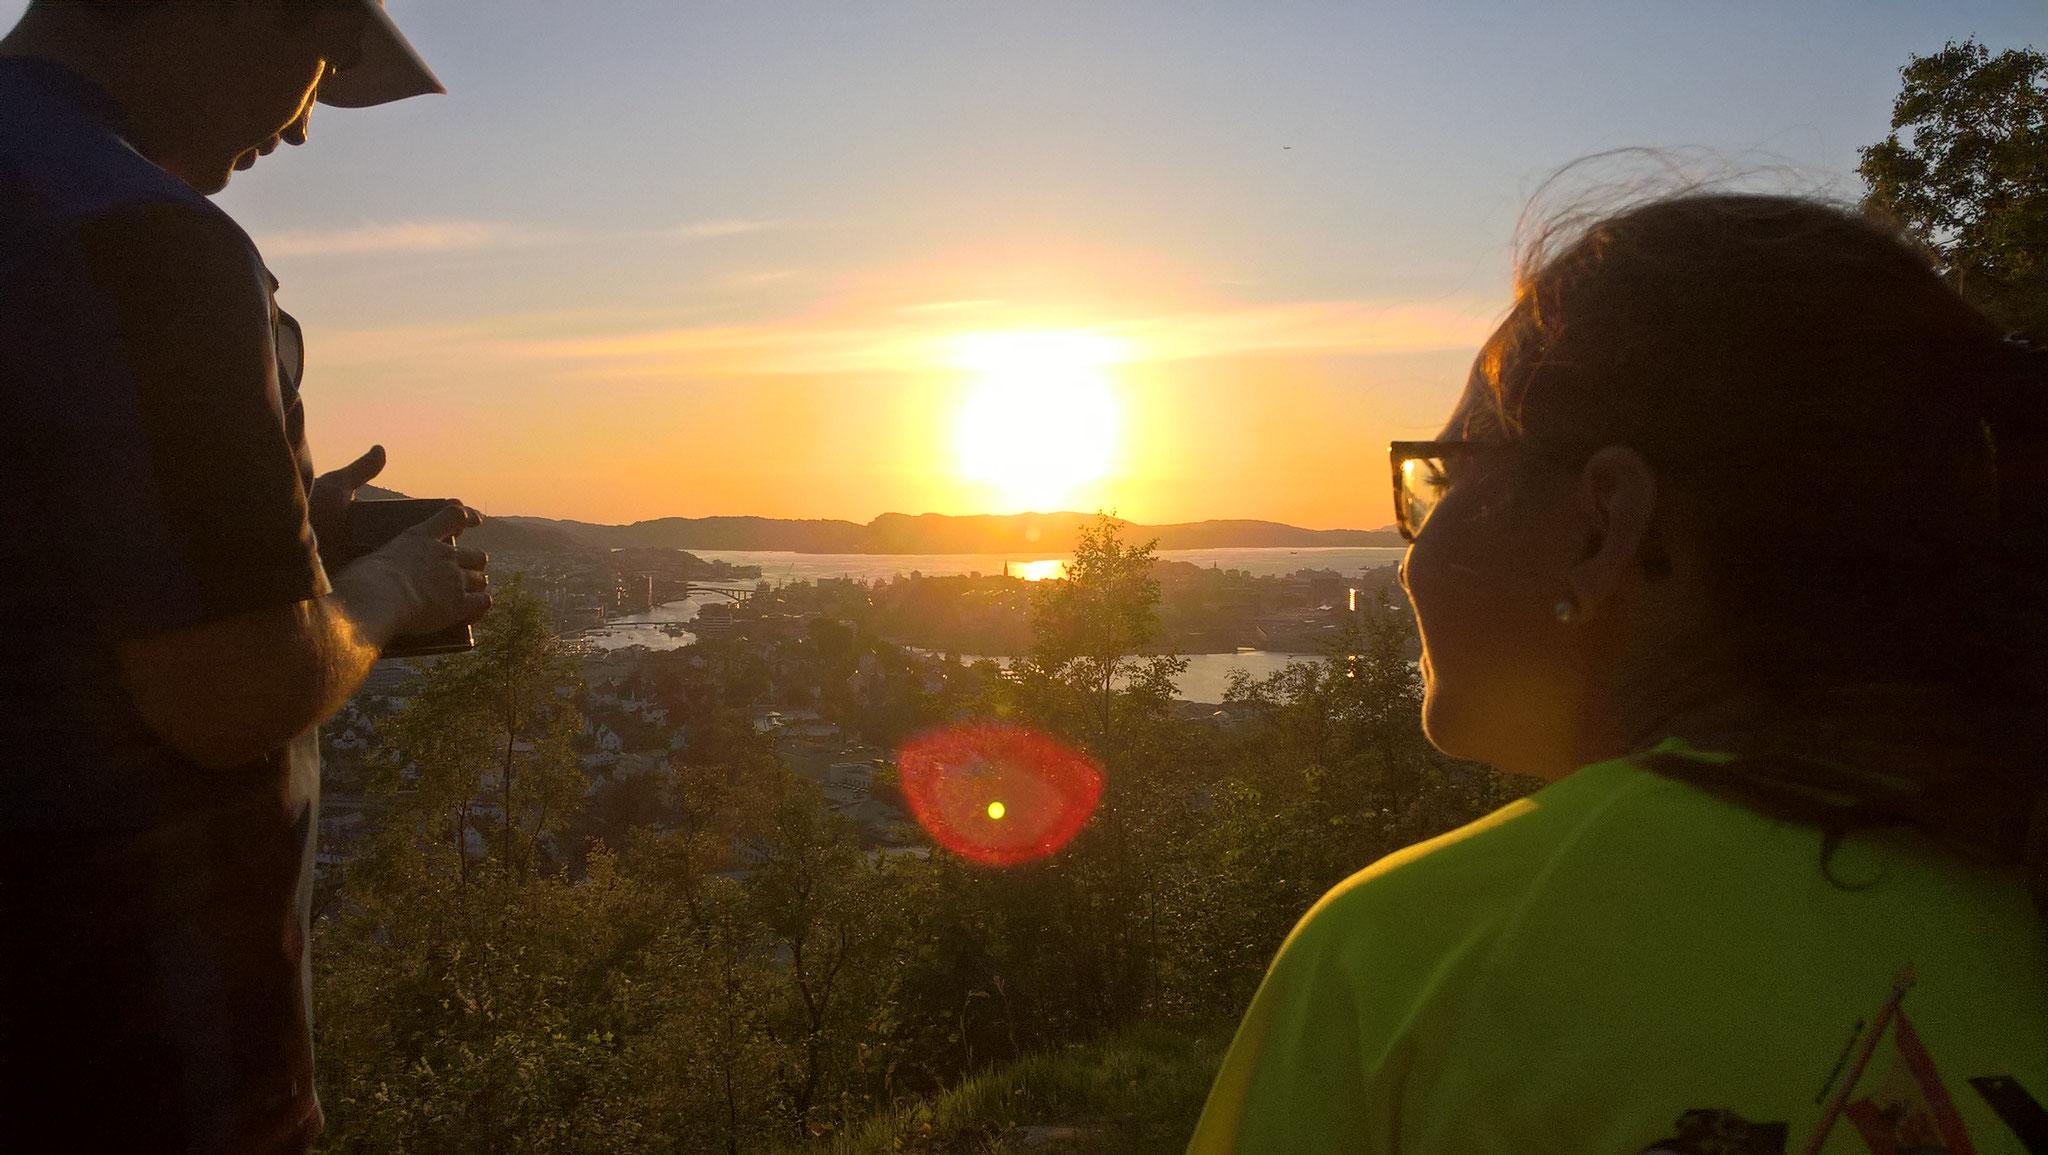 Sonnenuntergang auf dem Berg Ulrike